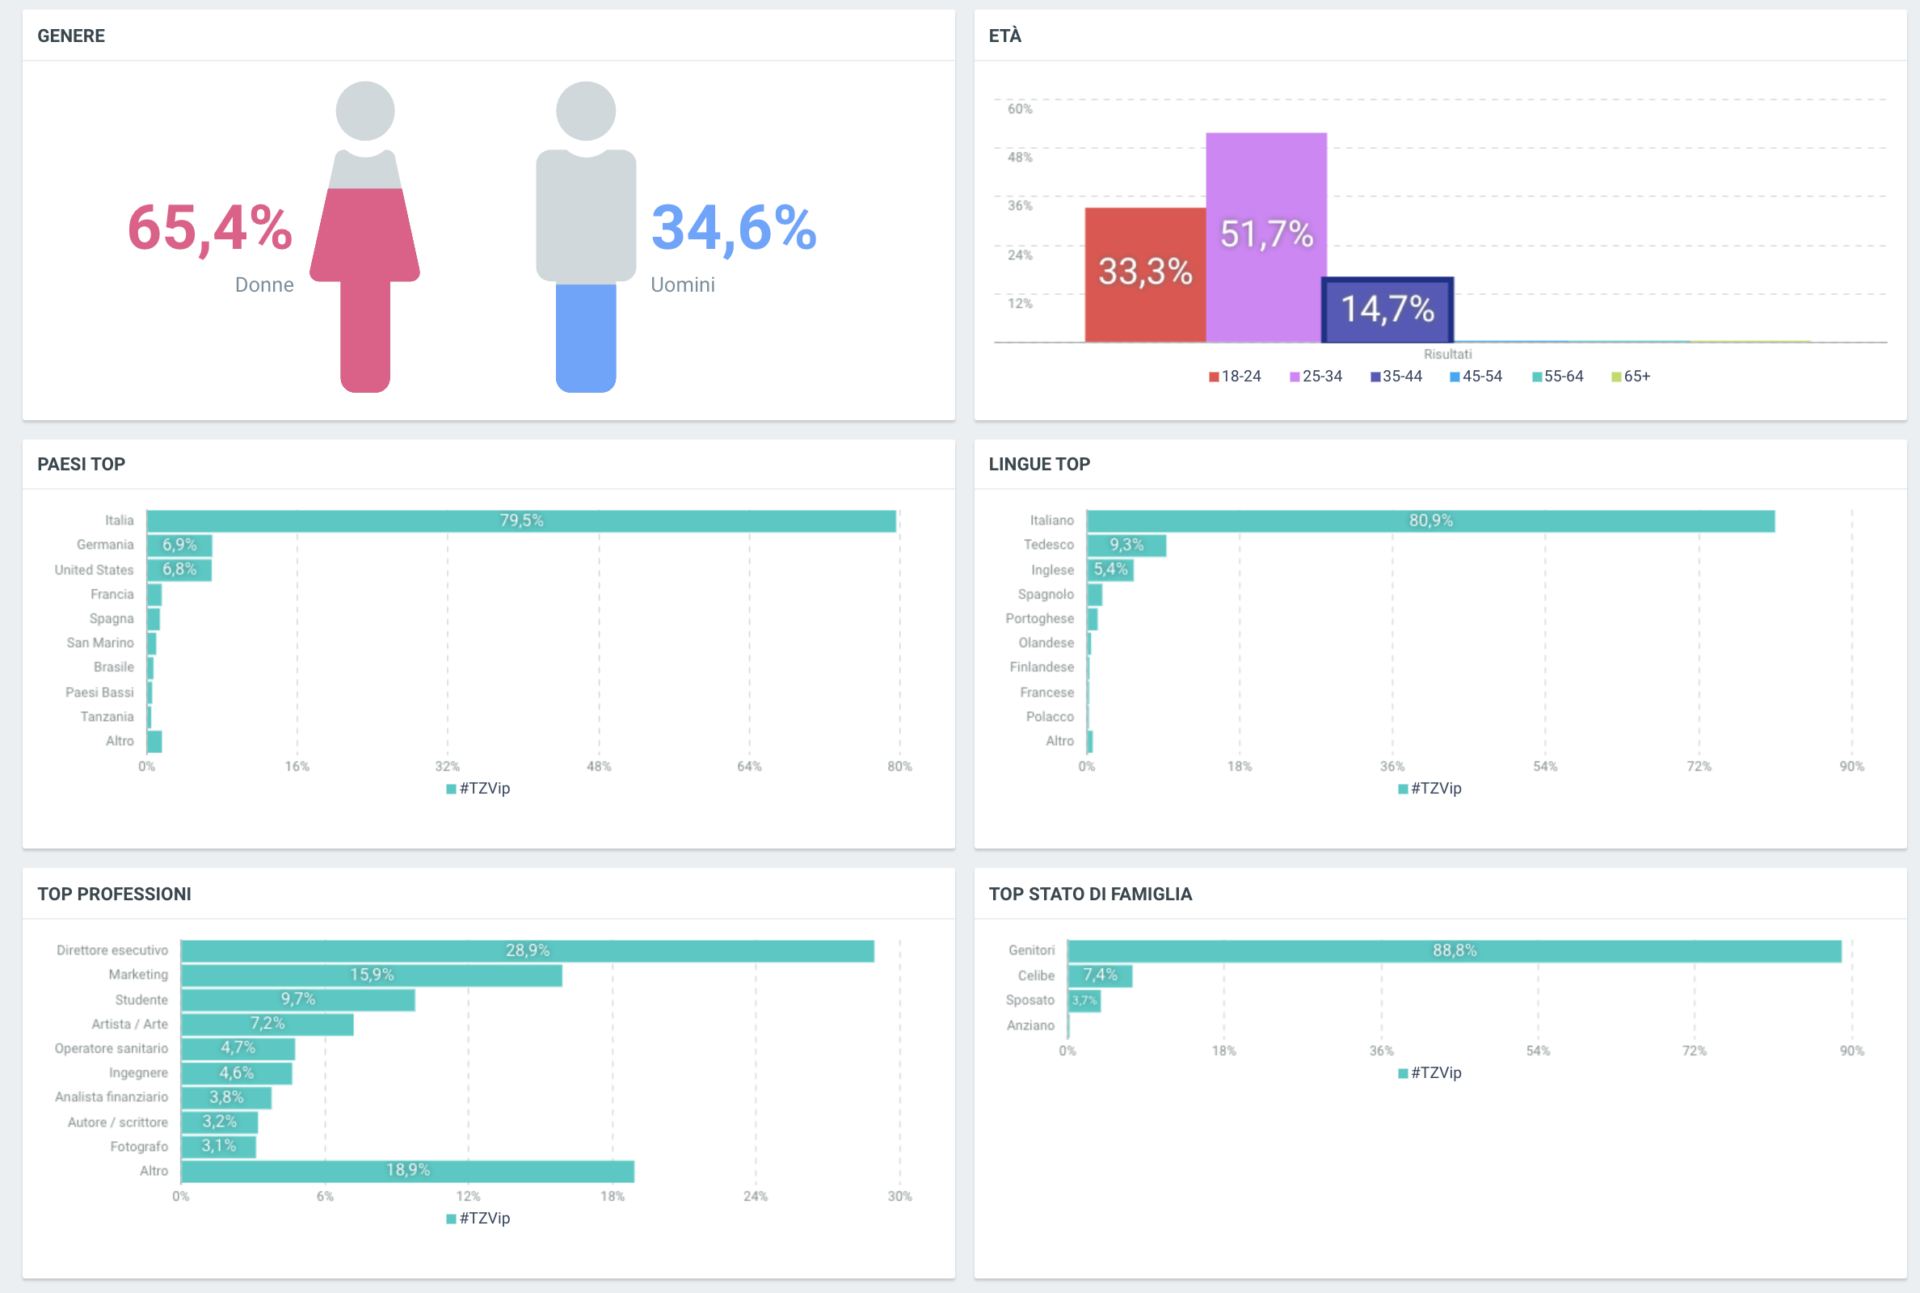 Tommaso Zorzi Dati Social: demografia